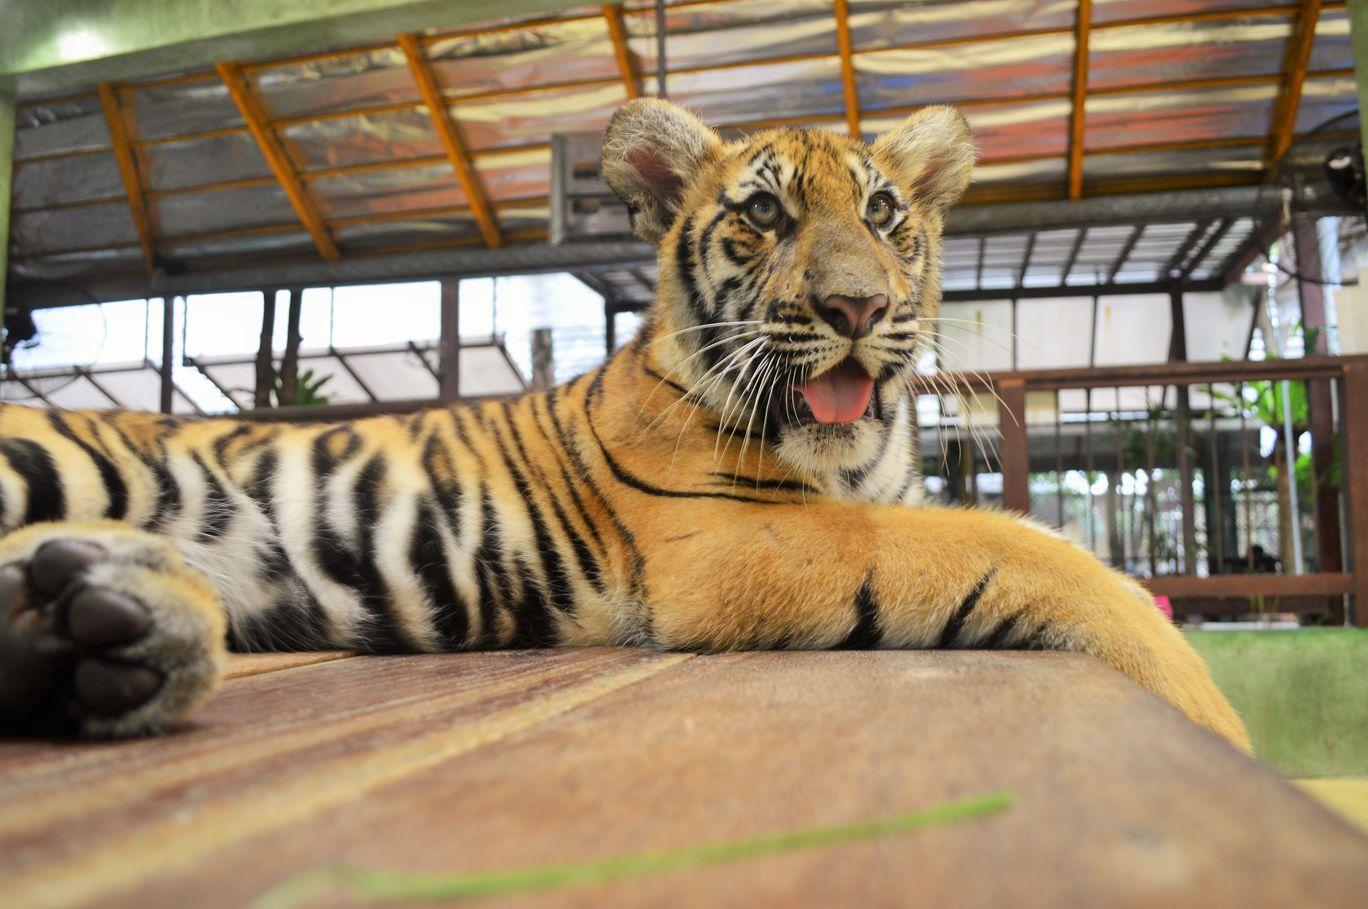 Photo of Tiger Kingdom Phuket By Khushboo Bhambri